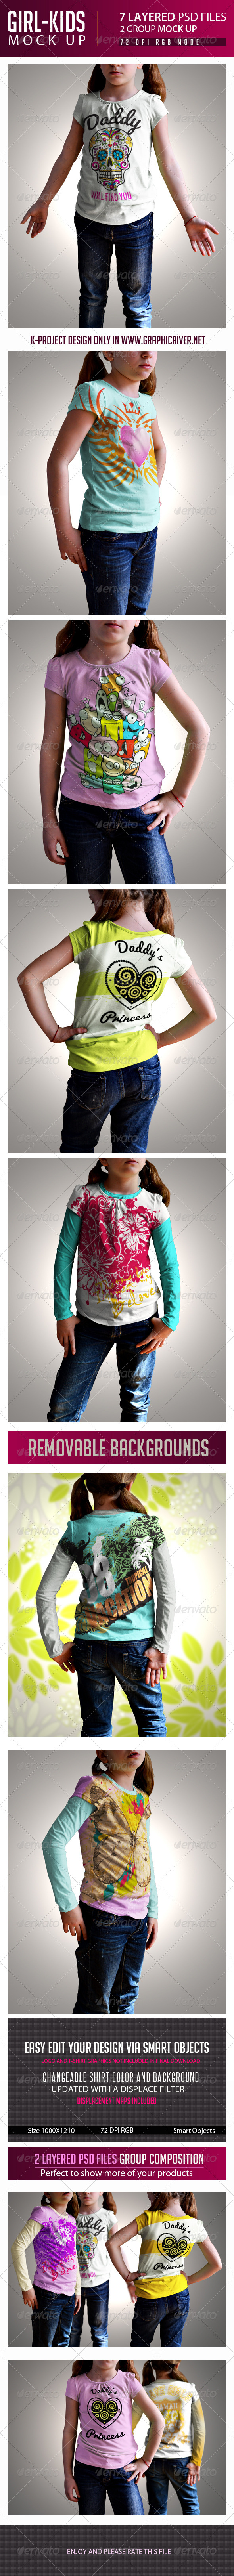 Girl Kids T-Shirt Mock Up - Product Mock-Ups Graphics